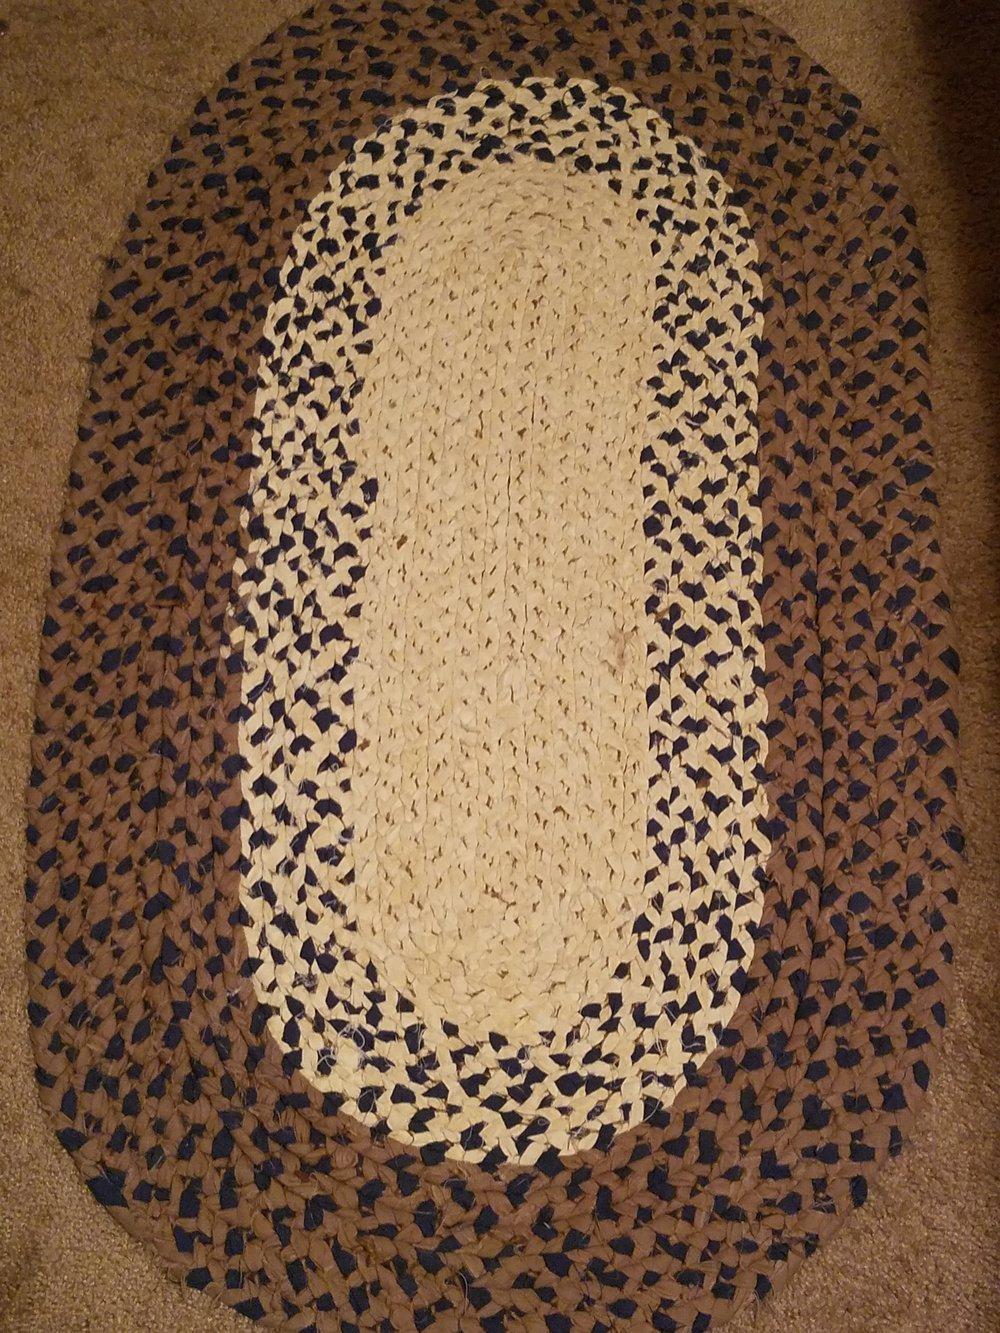 Braided Rugs: A Quick Tutorial || MLGardnerBooks.com